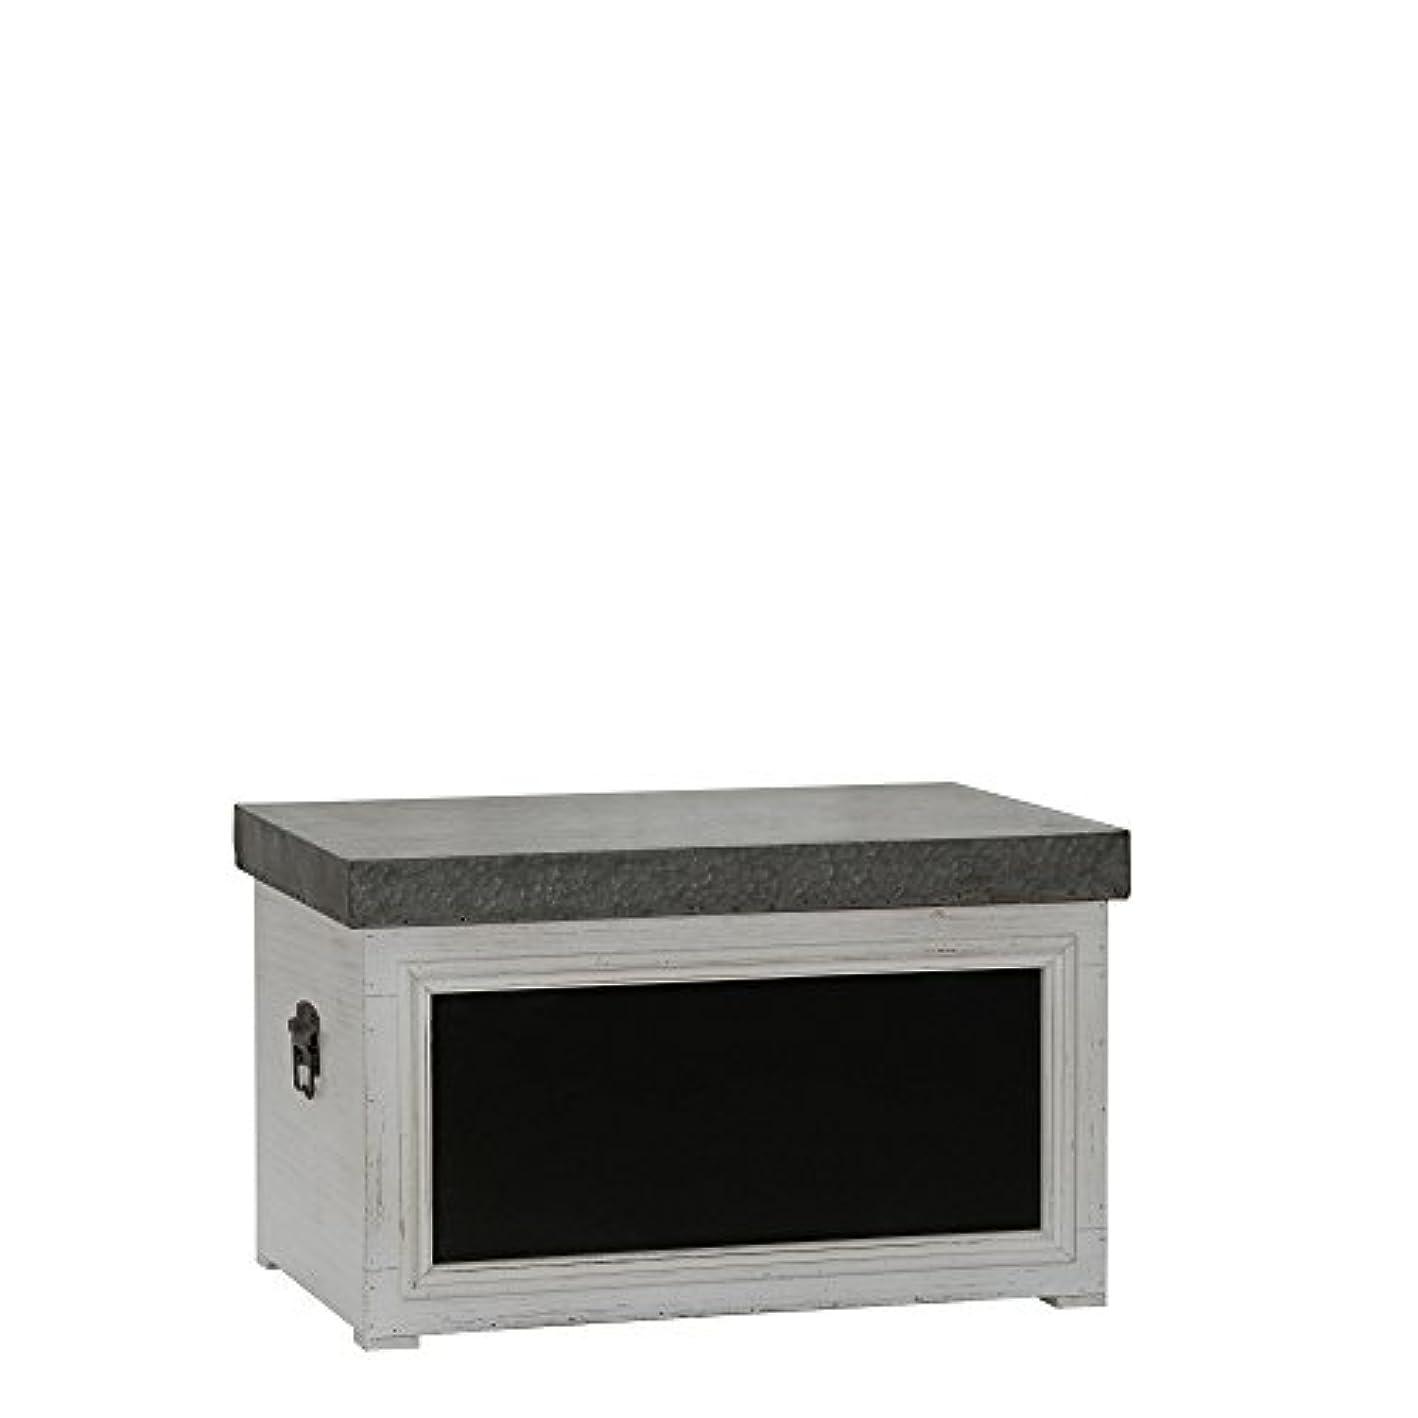 Household Essentials Chalk Board Storage Trunk Chest, Small, White